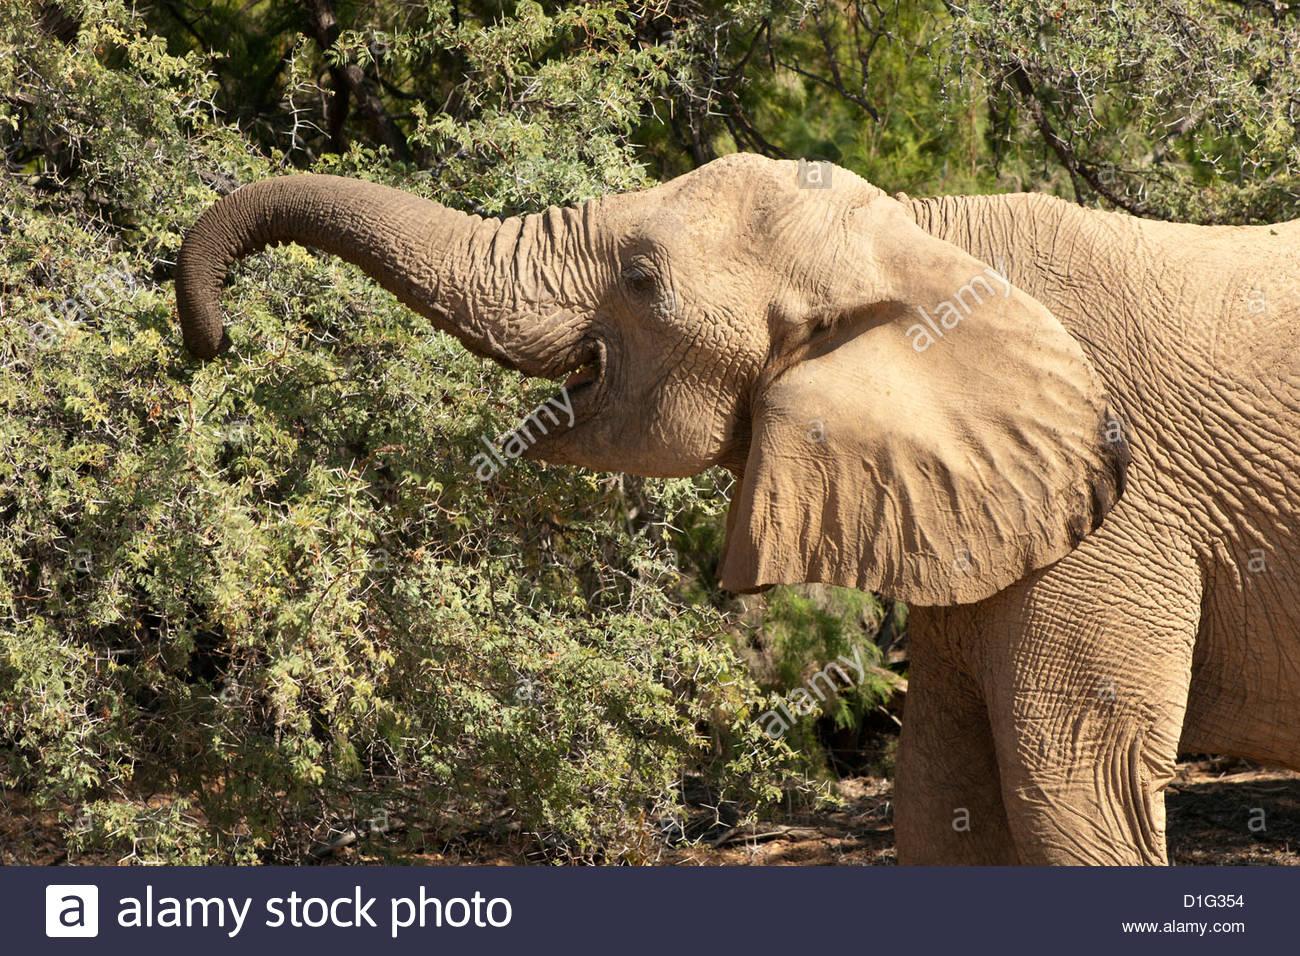 Desert elephant (Loxodonta africana), endemic to Namibia, adapted to desert and river valleys, Kaokoveld, Namibia, - Stock Image